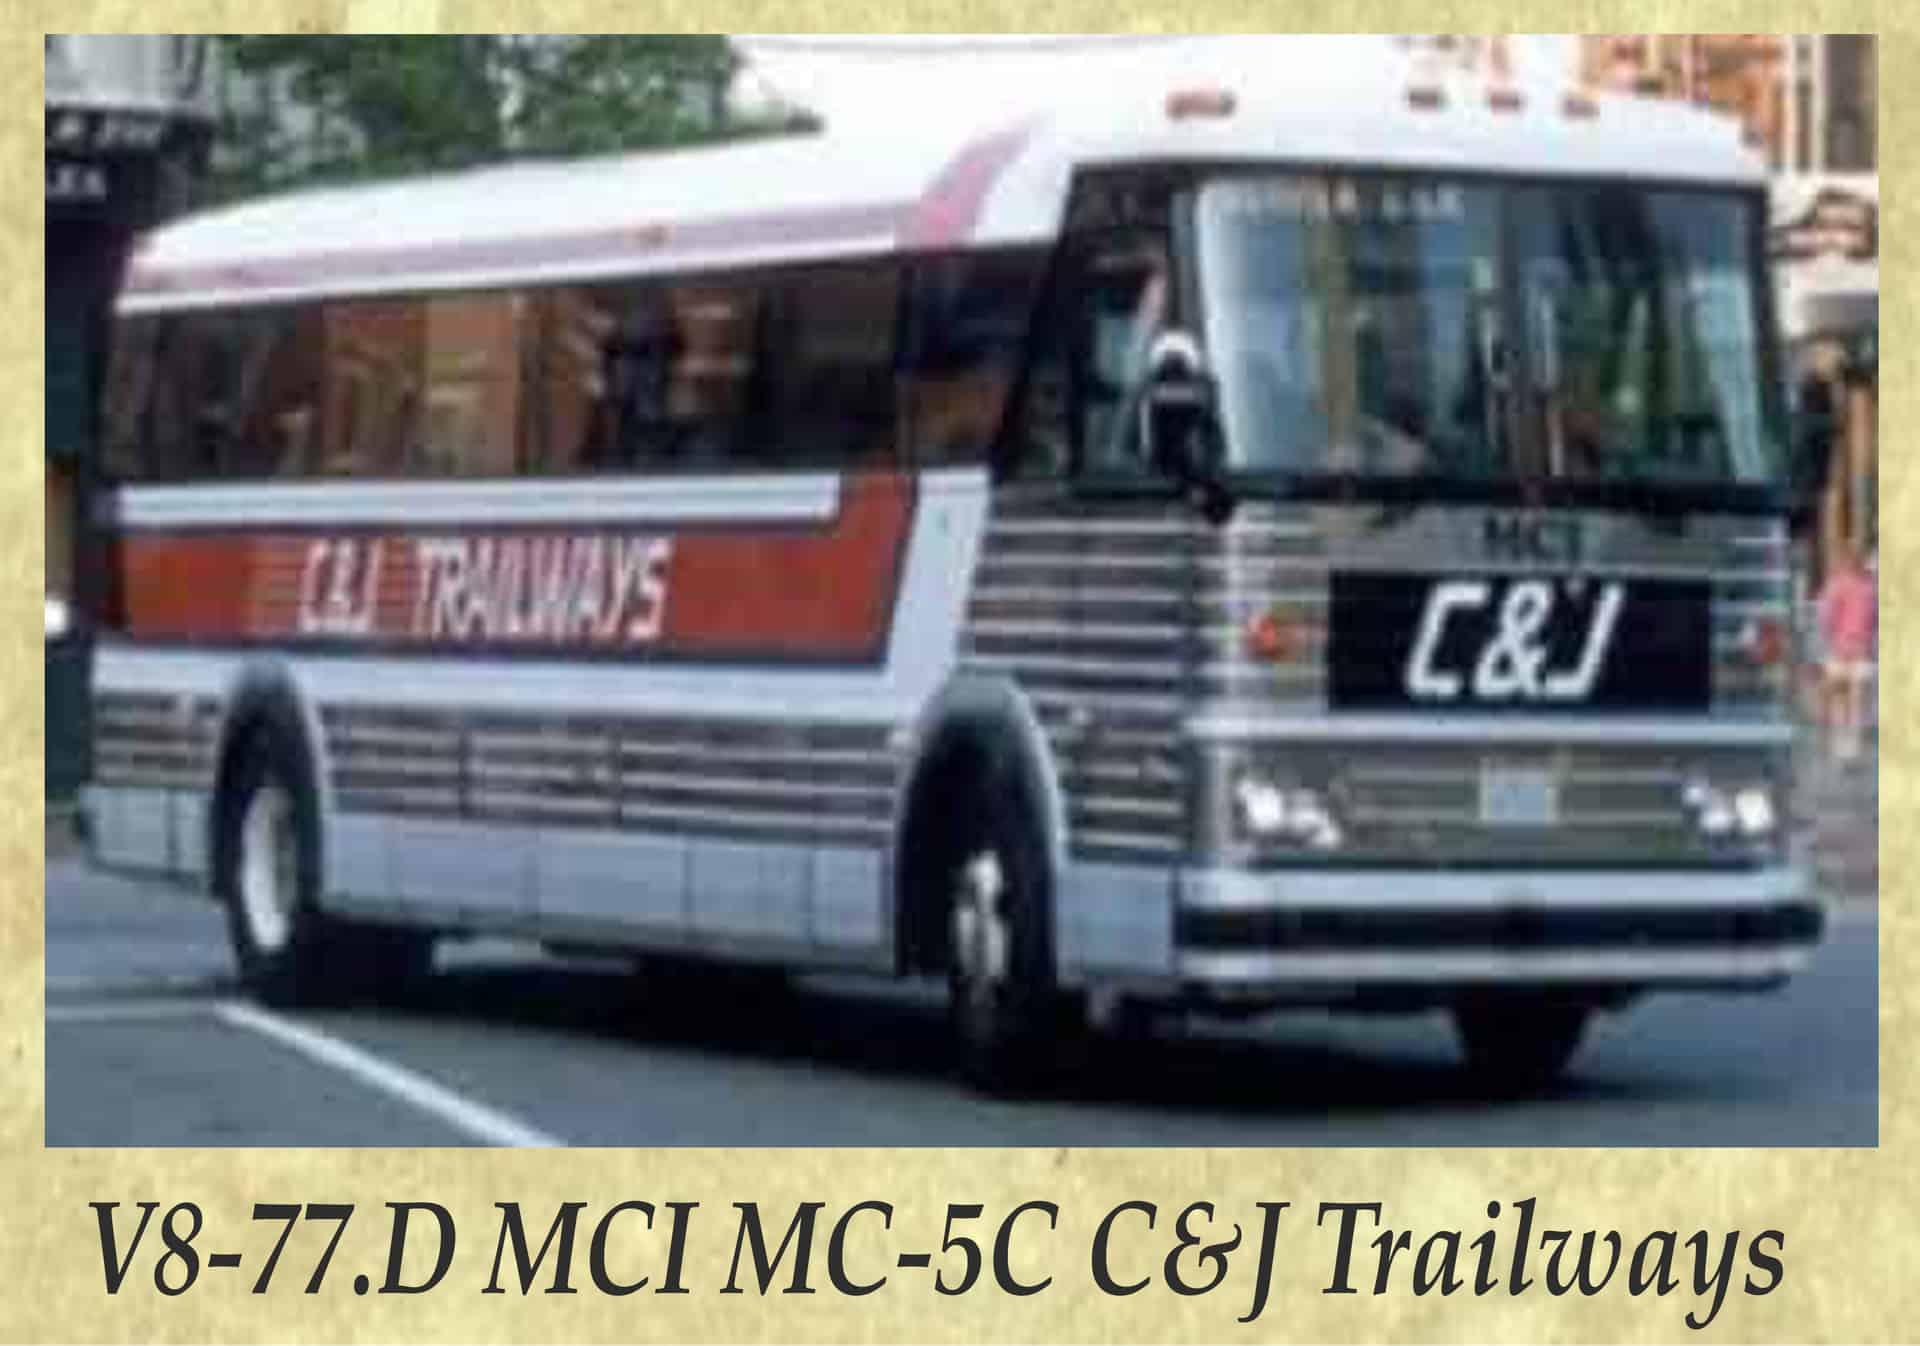 V8-77.D MCI MC-5C C&J Trailways